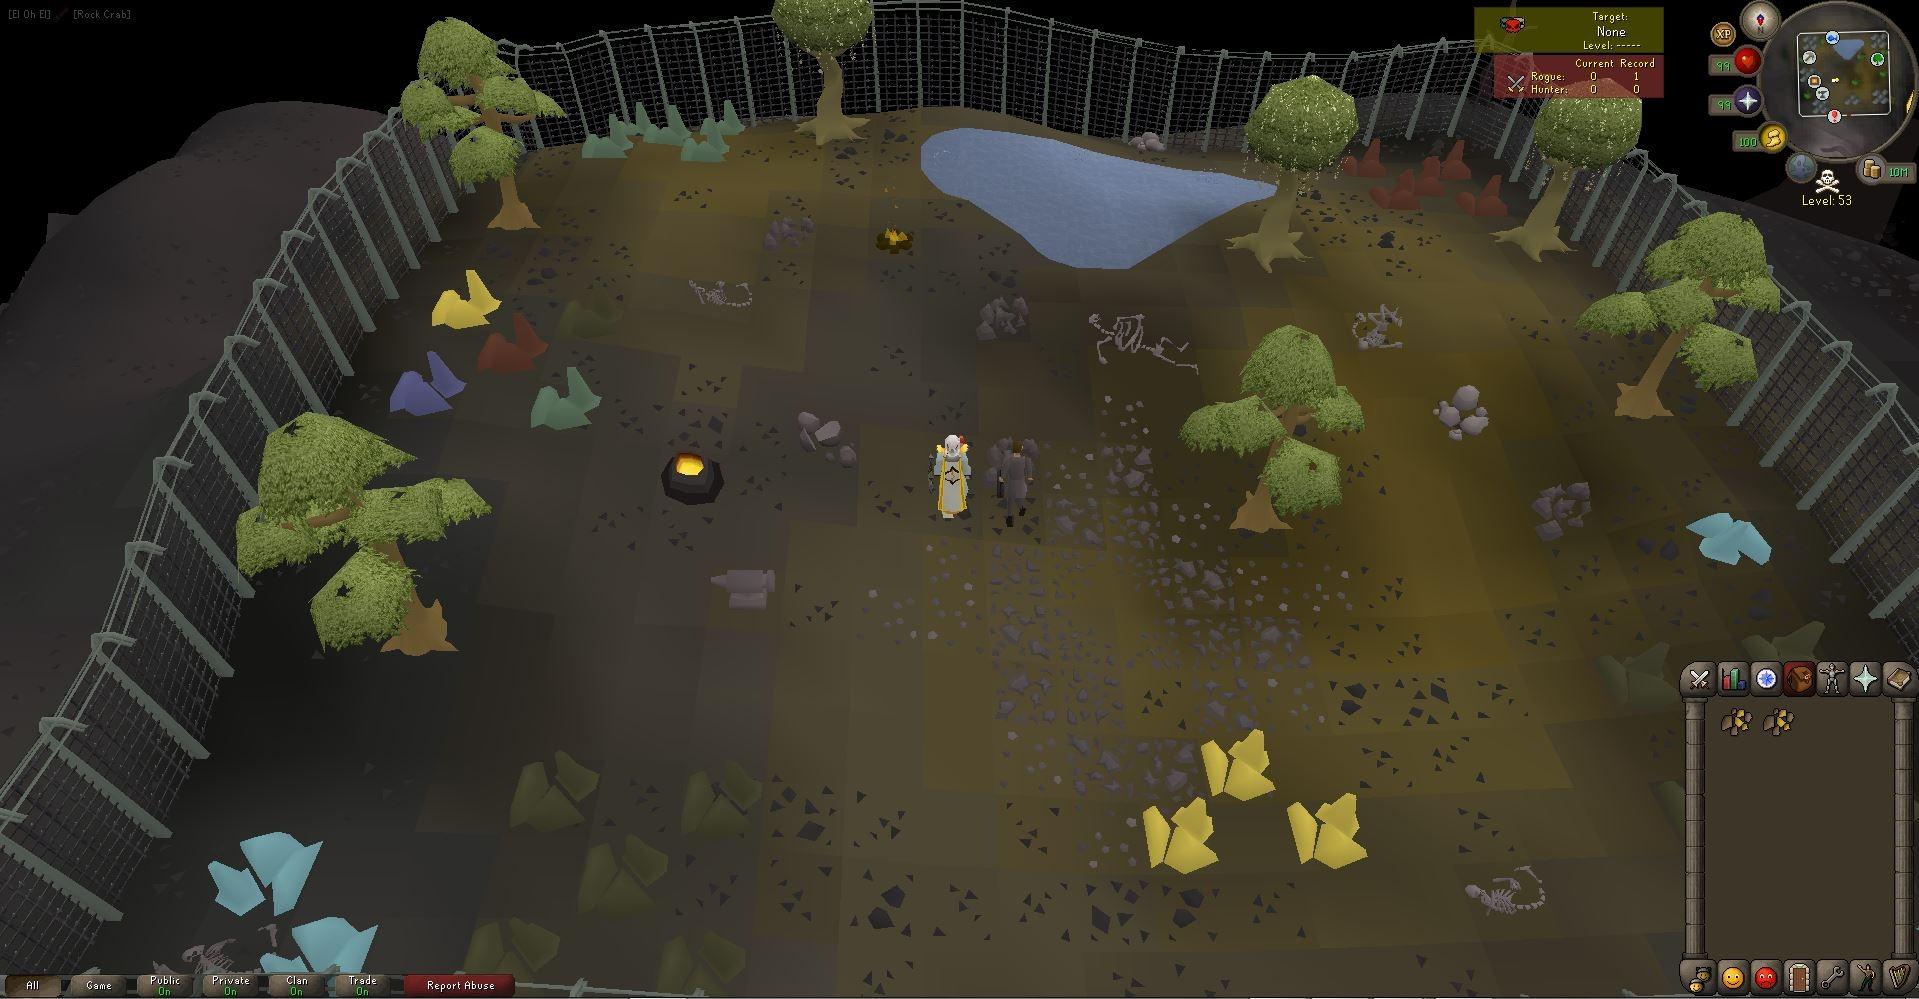 Os Demonic Gor Rsps Topg Today i proud to announce the development of my demonic gorillas bot. topg